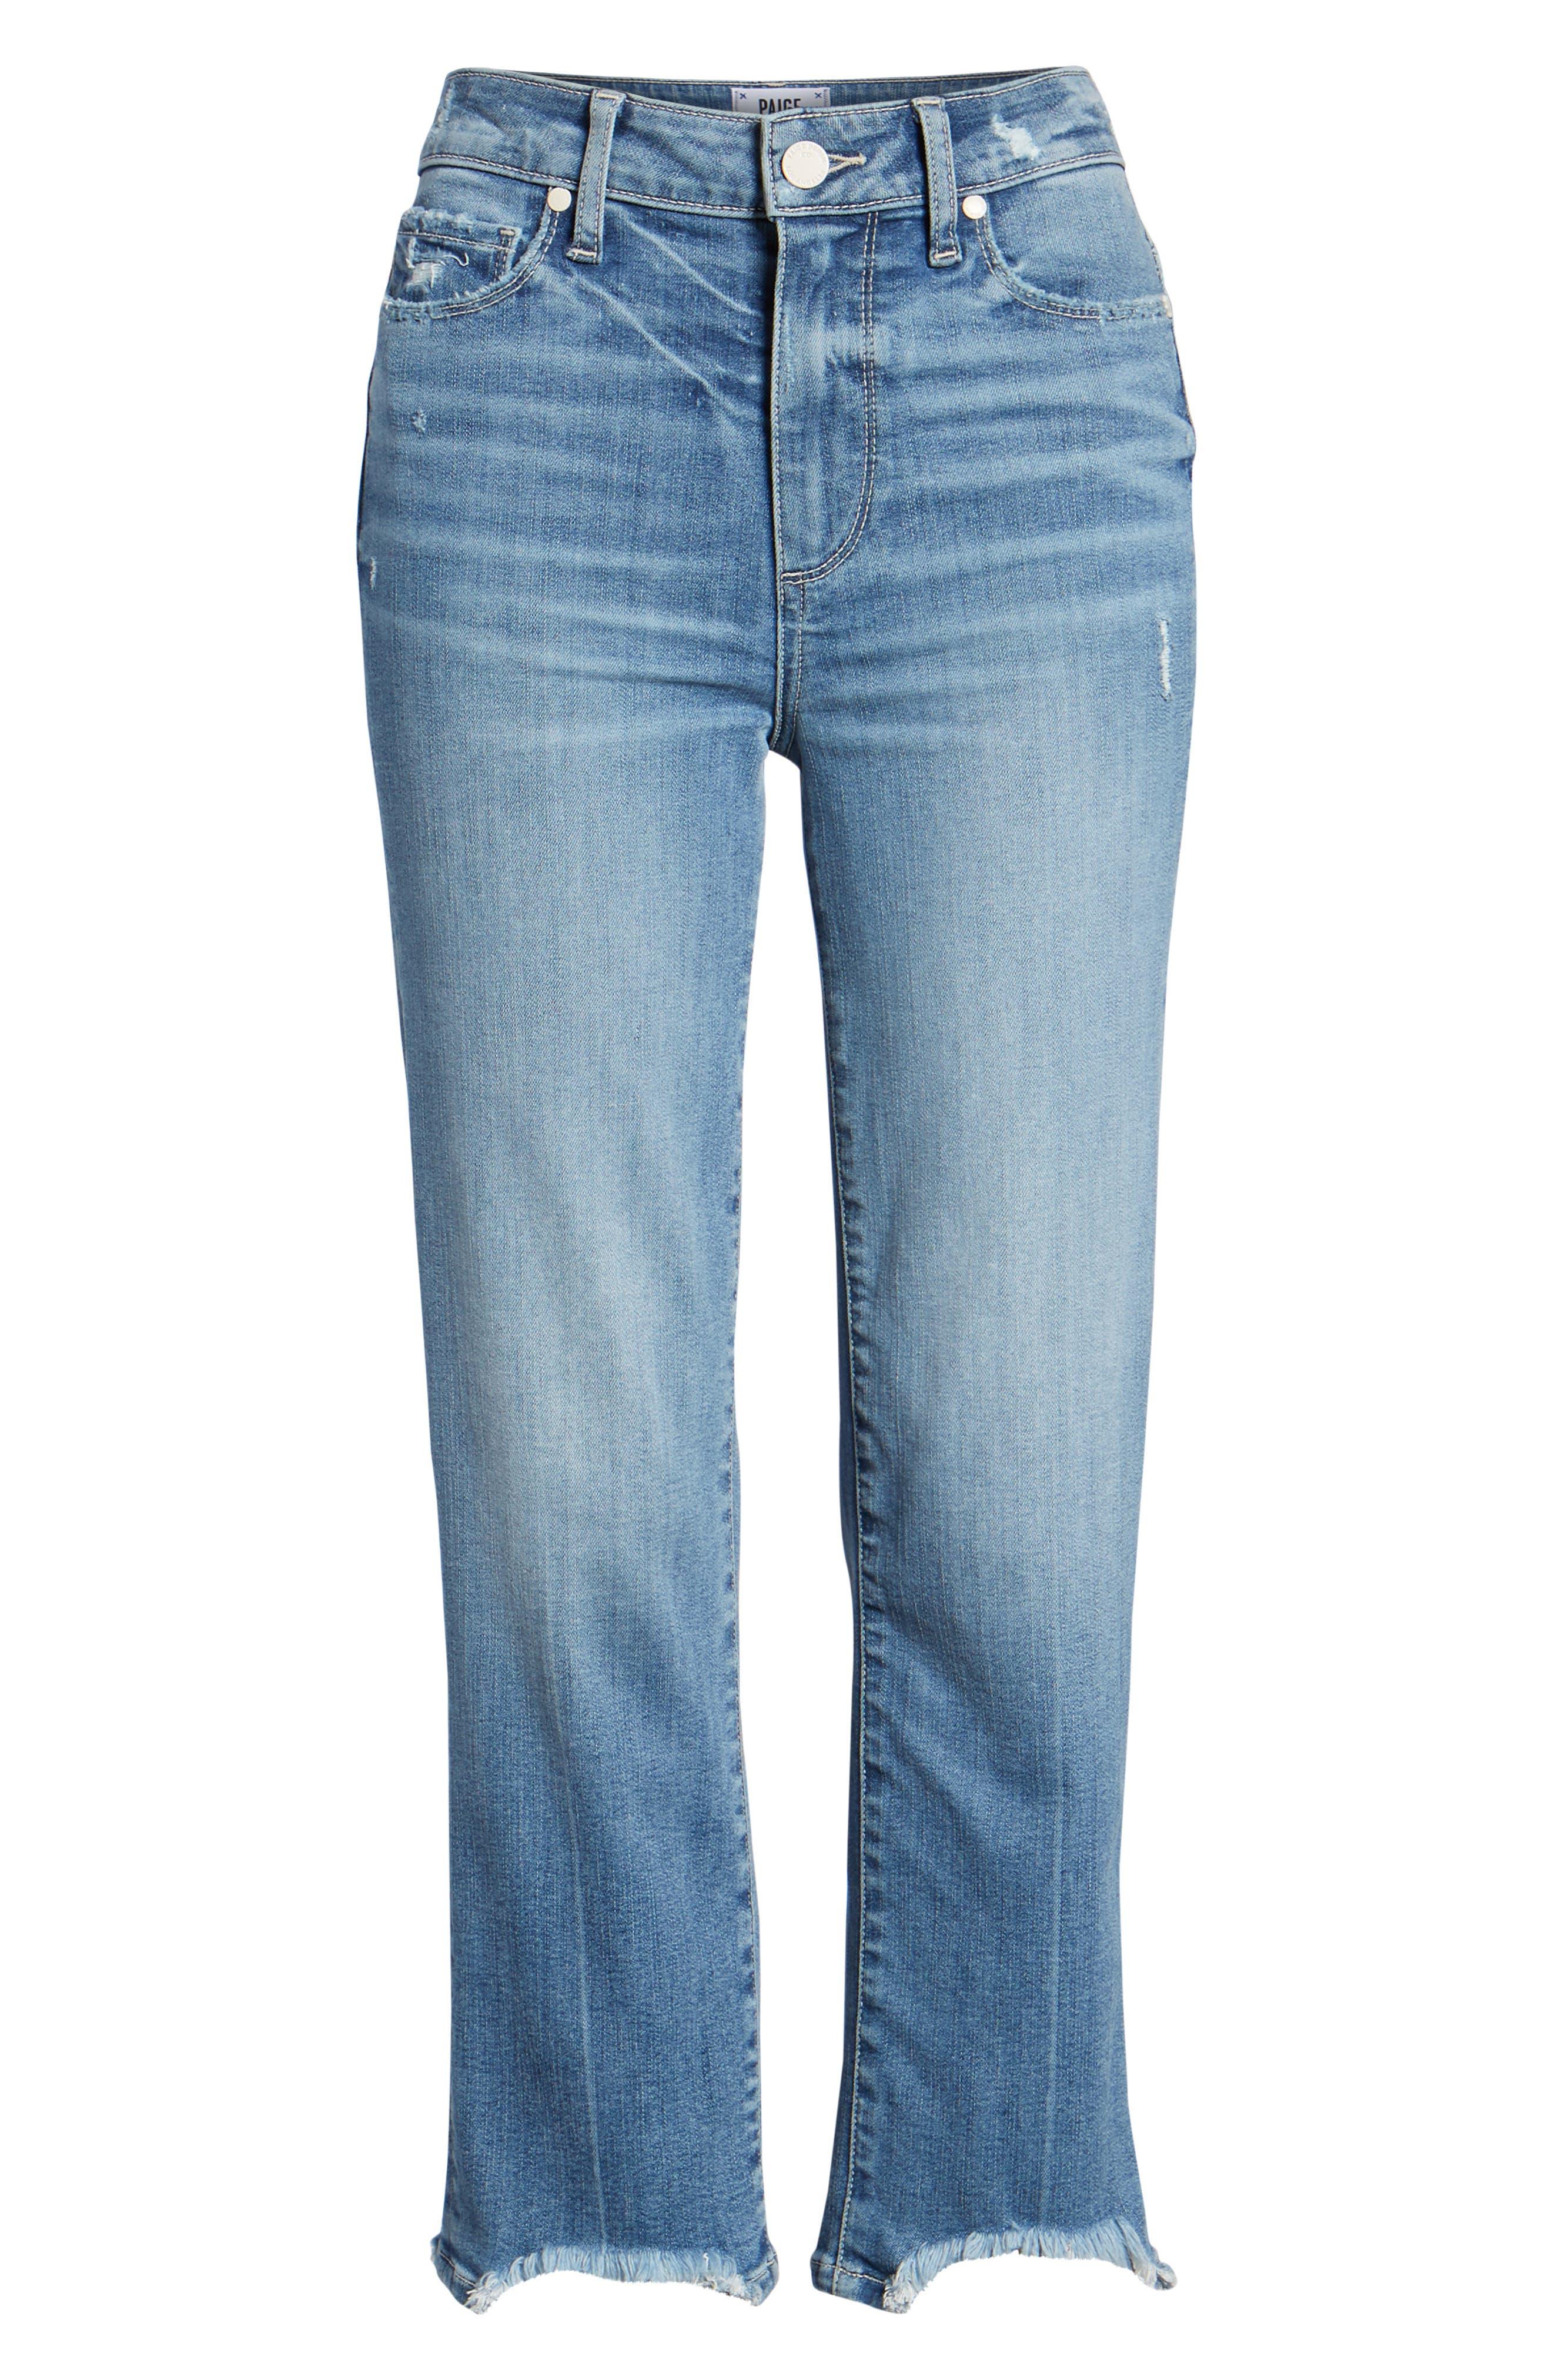 Transcend Vintage - Hoxton High Waist Crop Straight Leg Jeans,                             Alternate thumbnail 7, color,                             Zahara